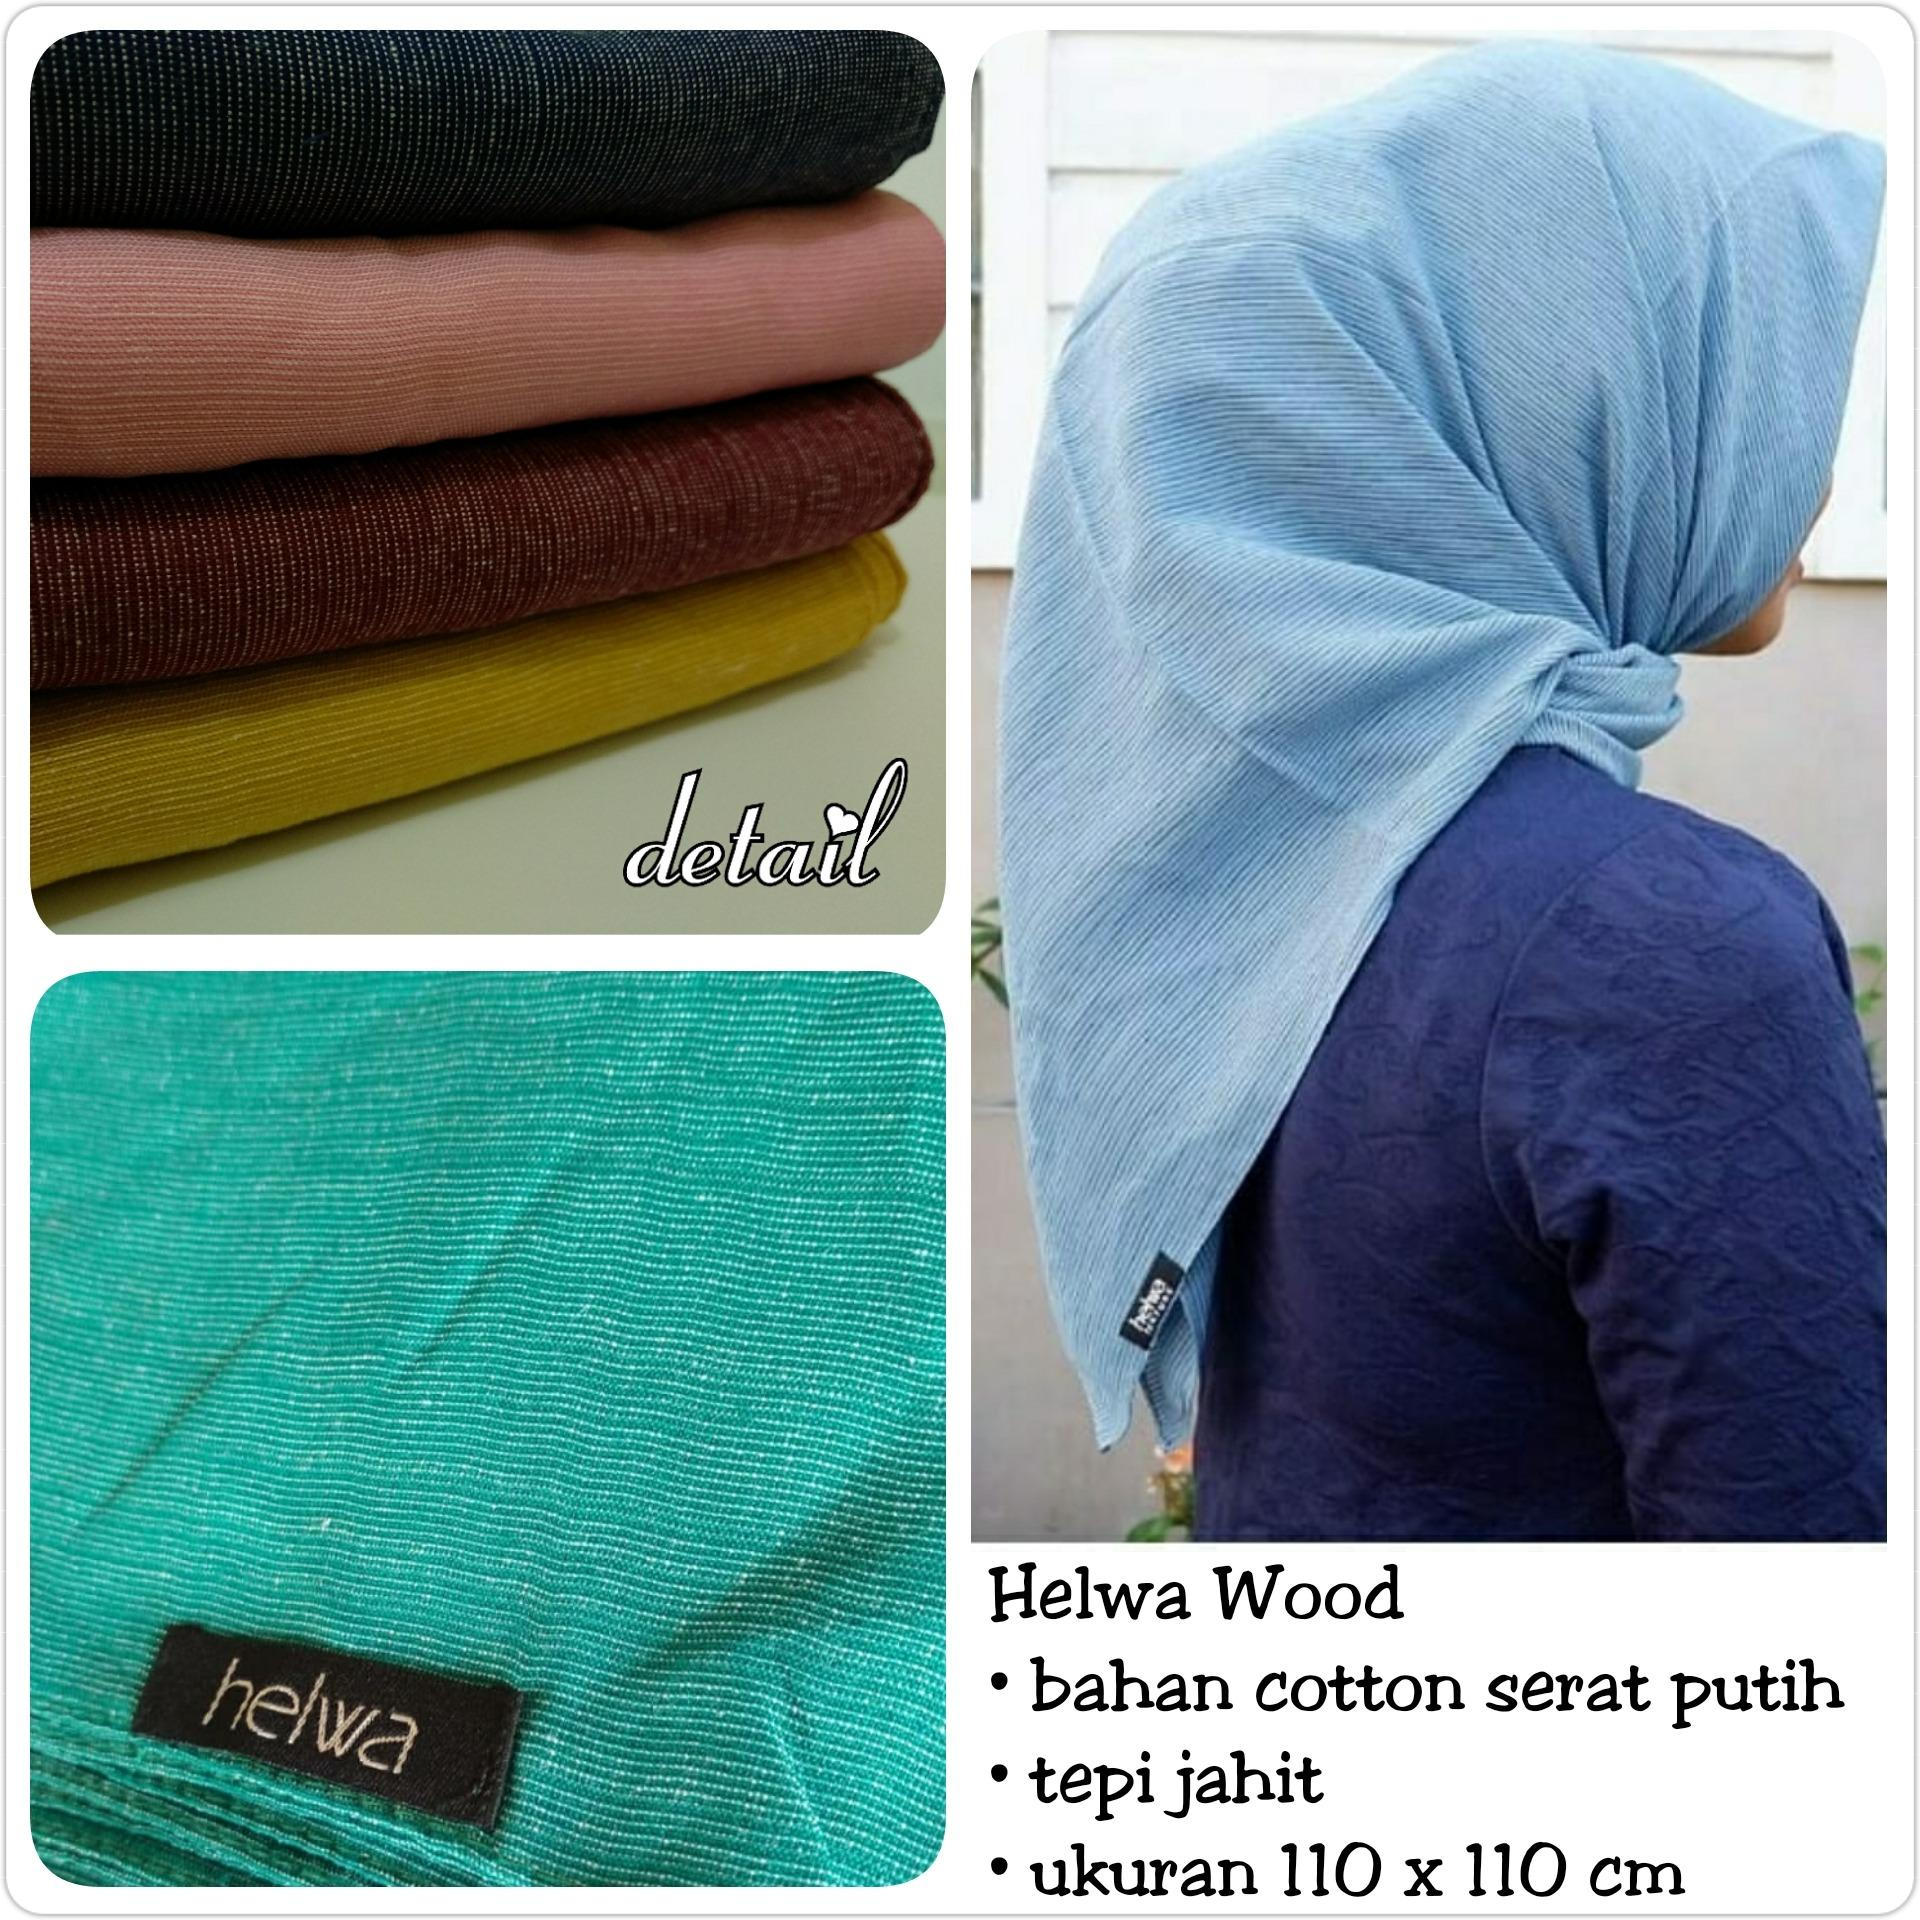 Harga Hijab Isi 2 Pcs Jilbab Segiempat Serat Hitam Helwa Texture Ansania Lovilla Shinar Glamour Boleh Pilih Warna Motif Online Dki Jakarta